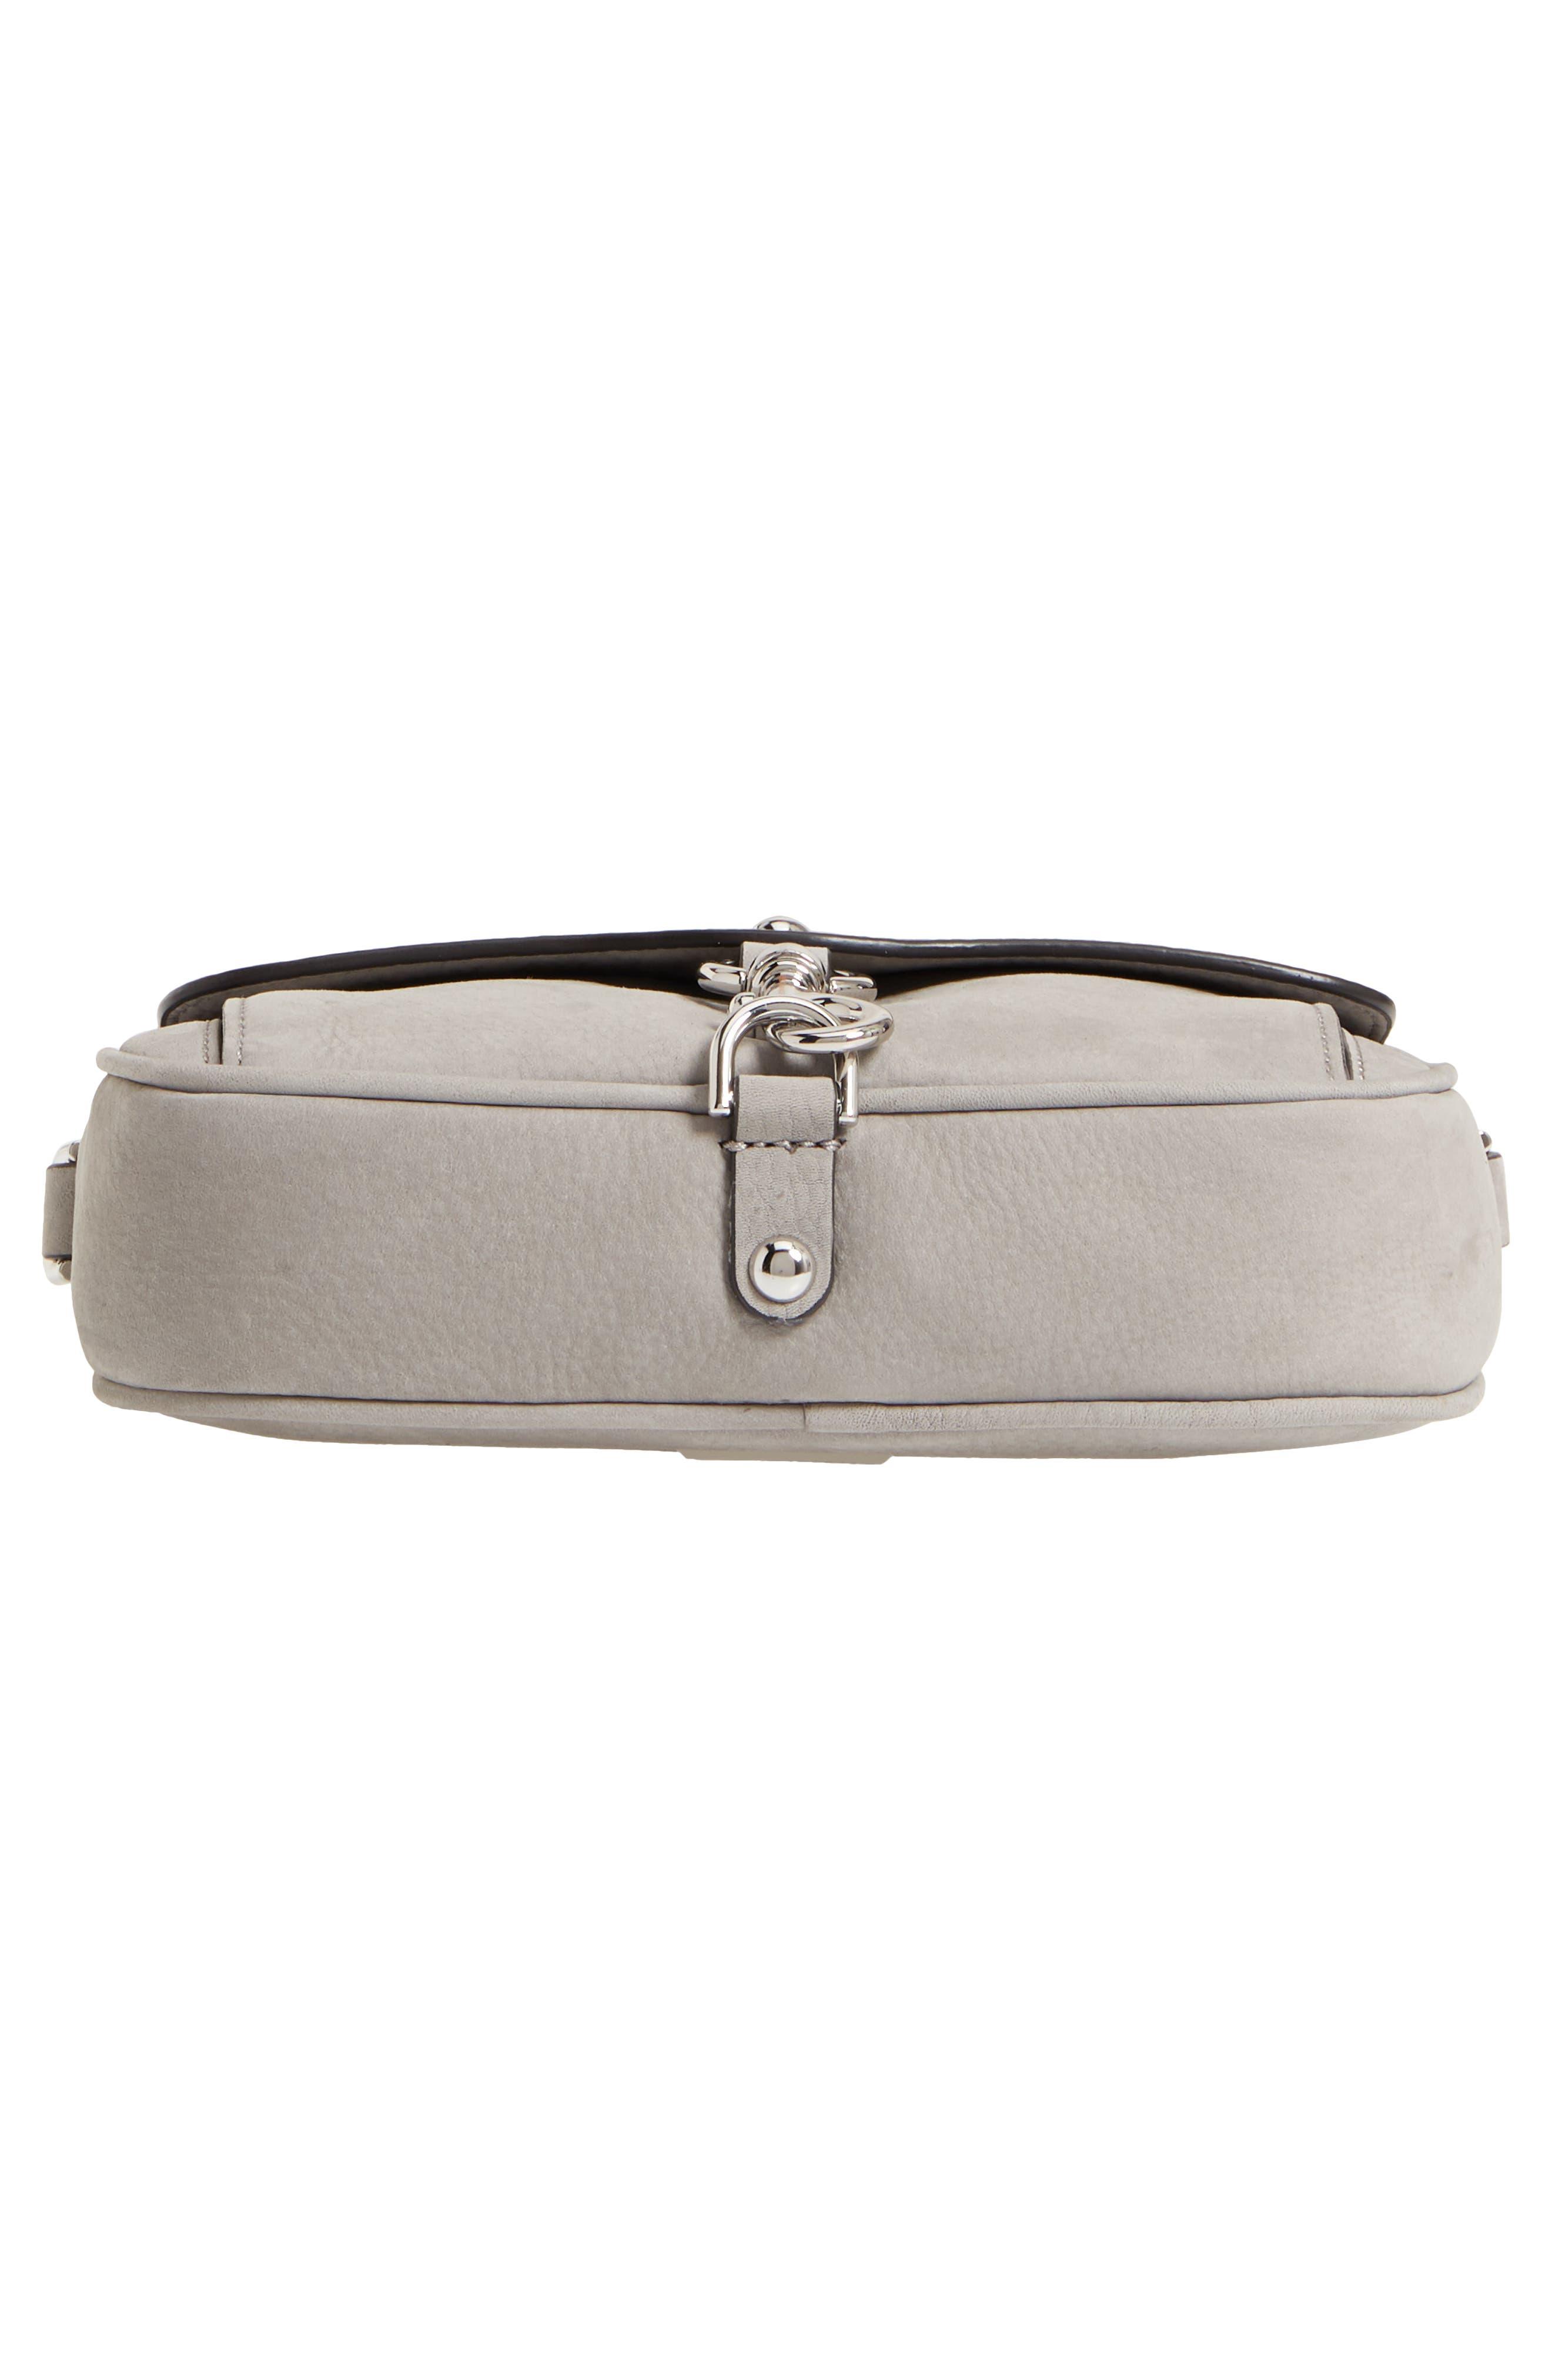 REBECCA MINKOFF,                             Blythe Leather Crossbody Bag,                             Alternate thumbnail 6, color,                             020